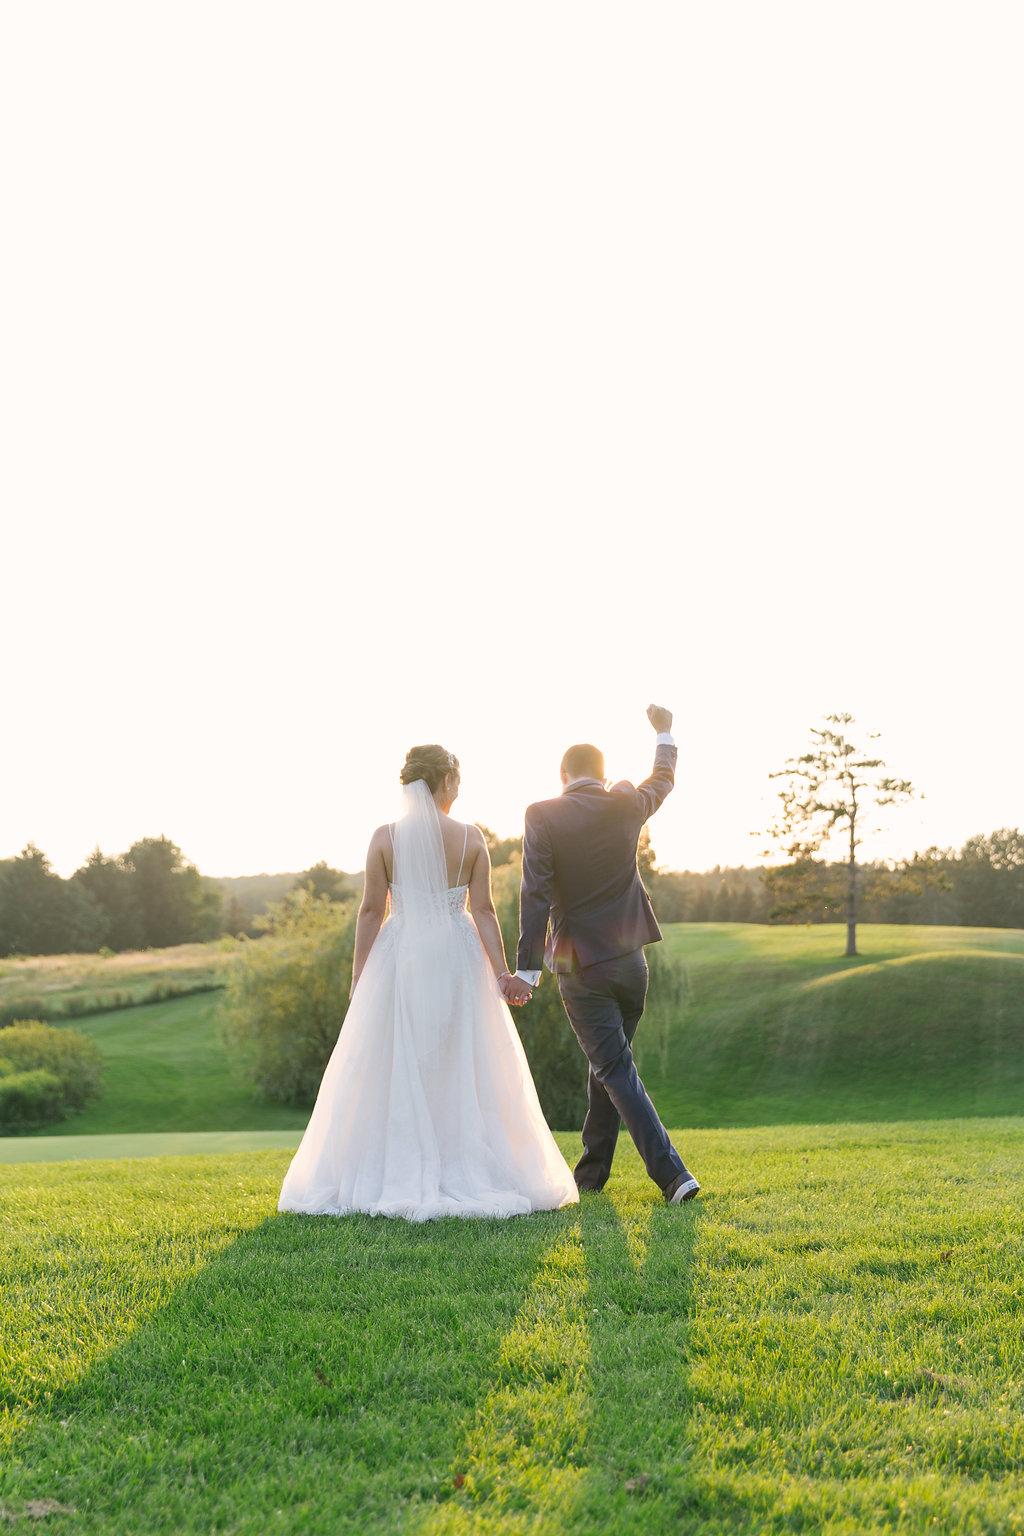 Fun Bridal Portraits | Erin Blackwood Photo | spunkysapphire.com